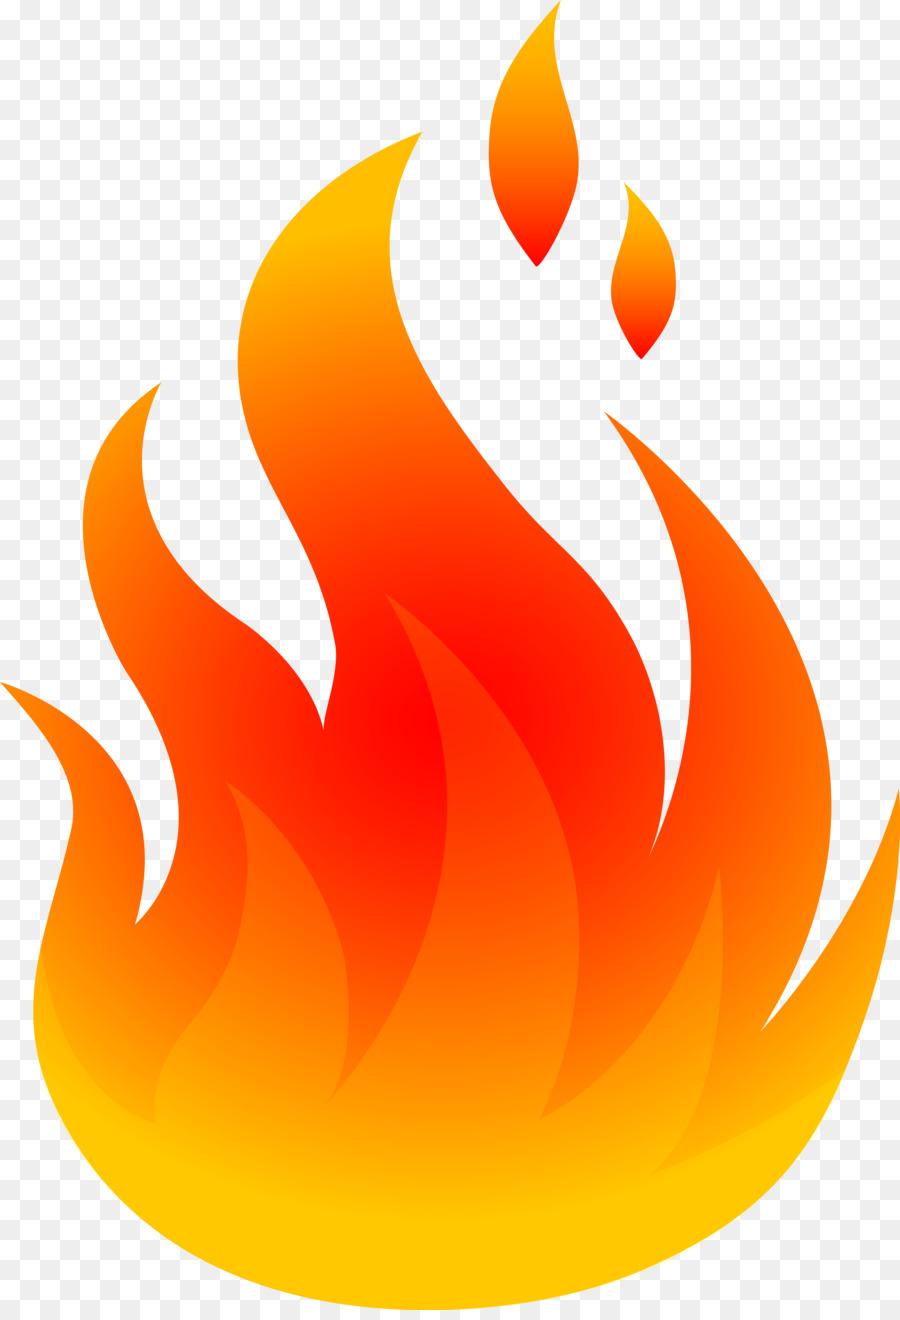 Fire clip art realistic. Flame clipart